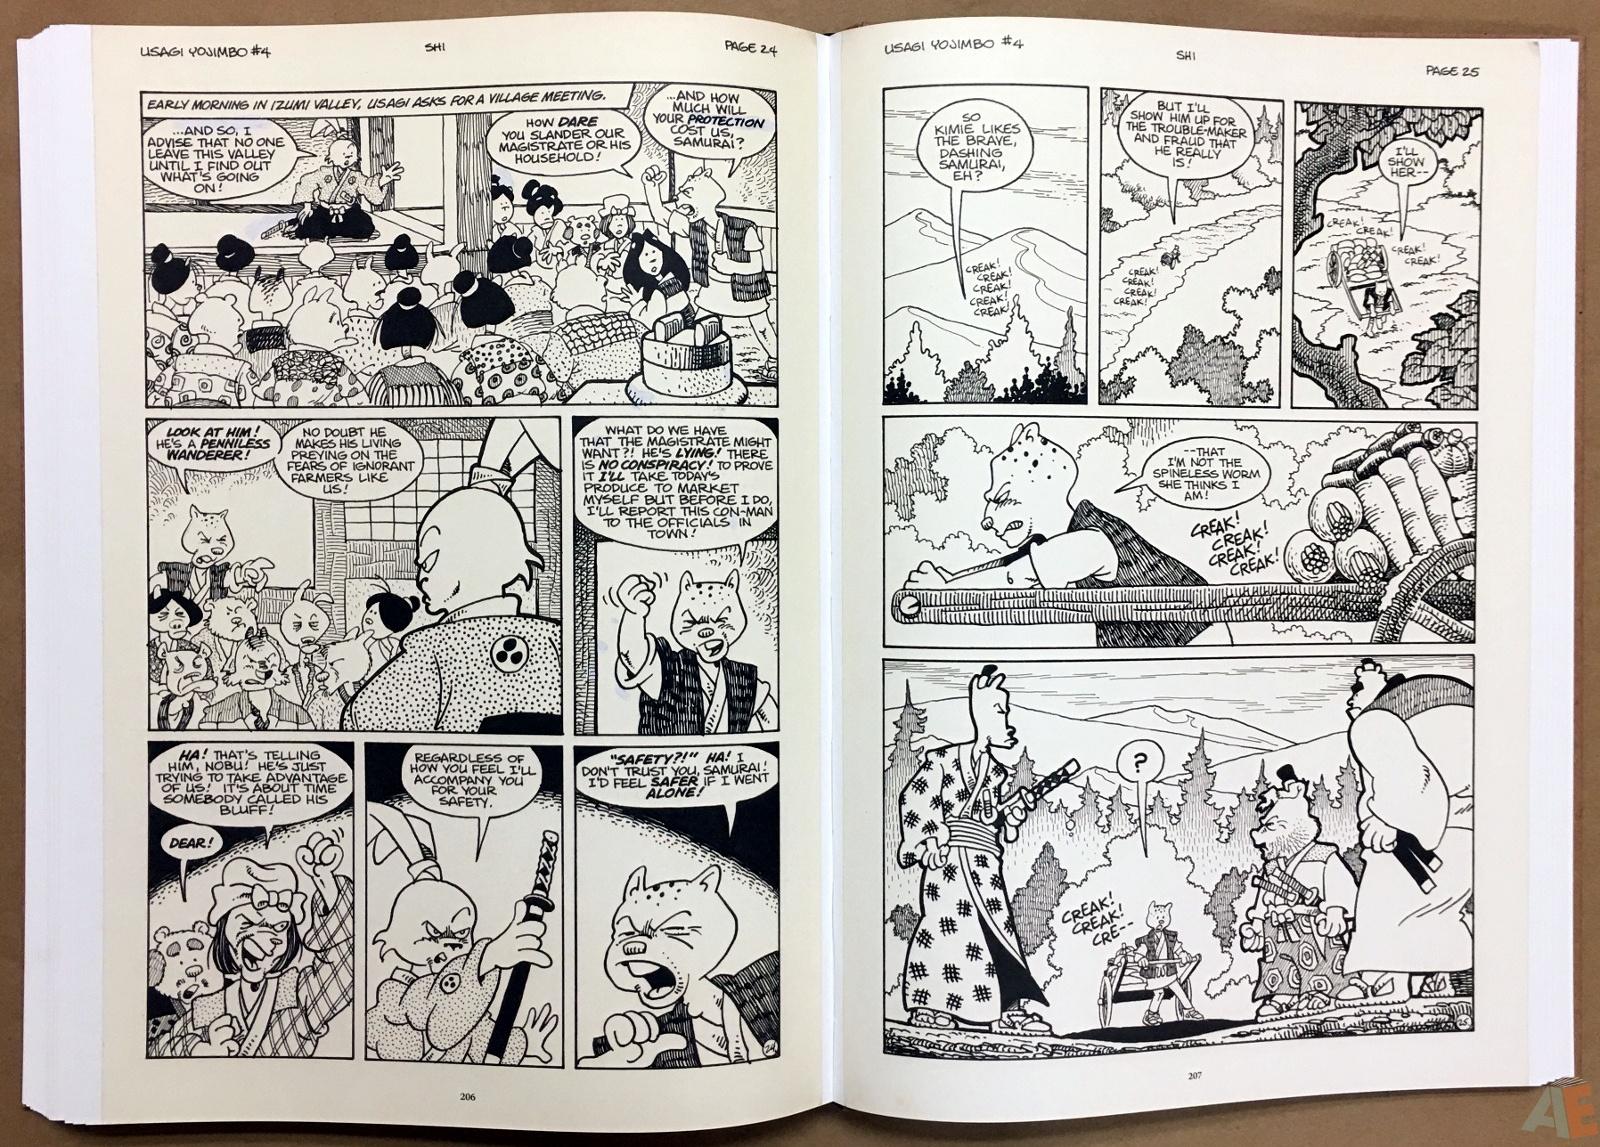 Usagi Yojimbo: Samurai and Other Stories Gallery Edition 36